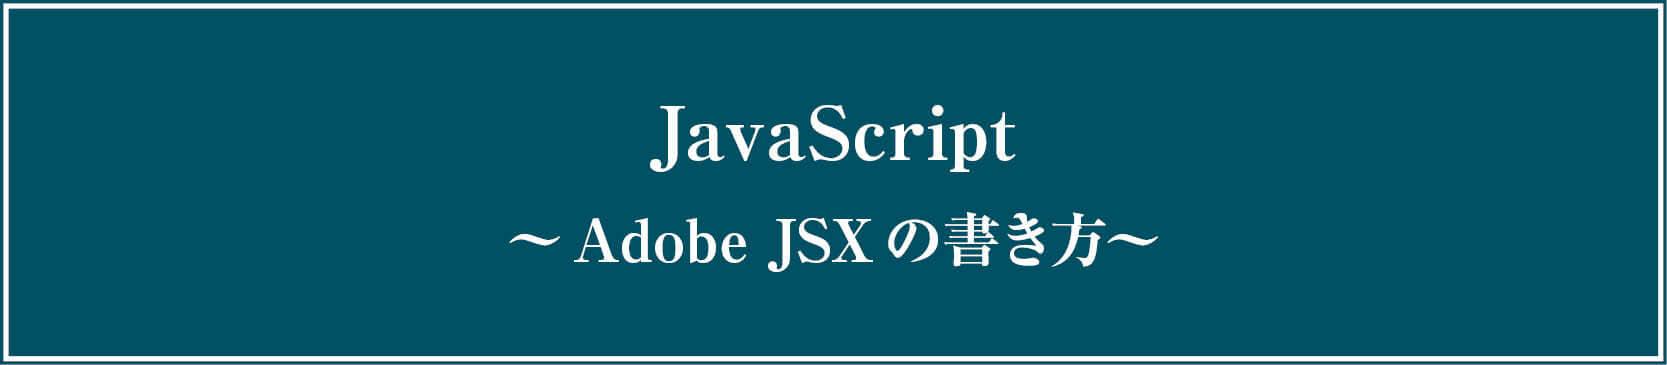 Adobe JavaScriptの書き方